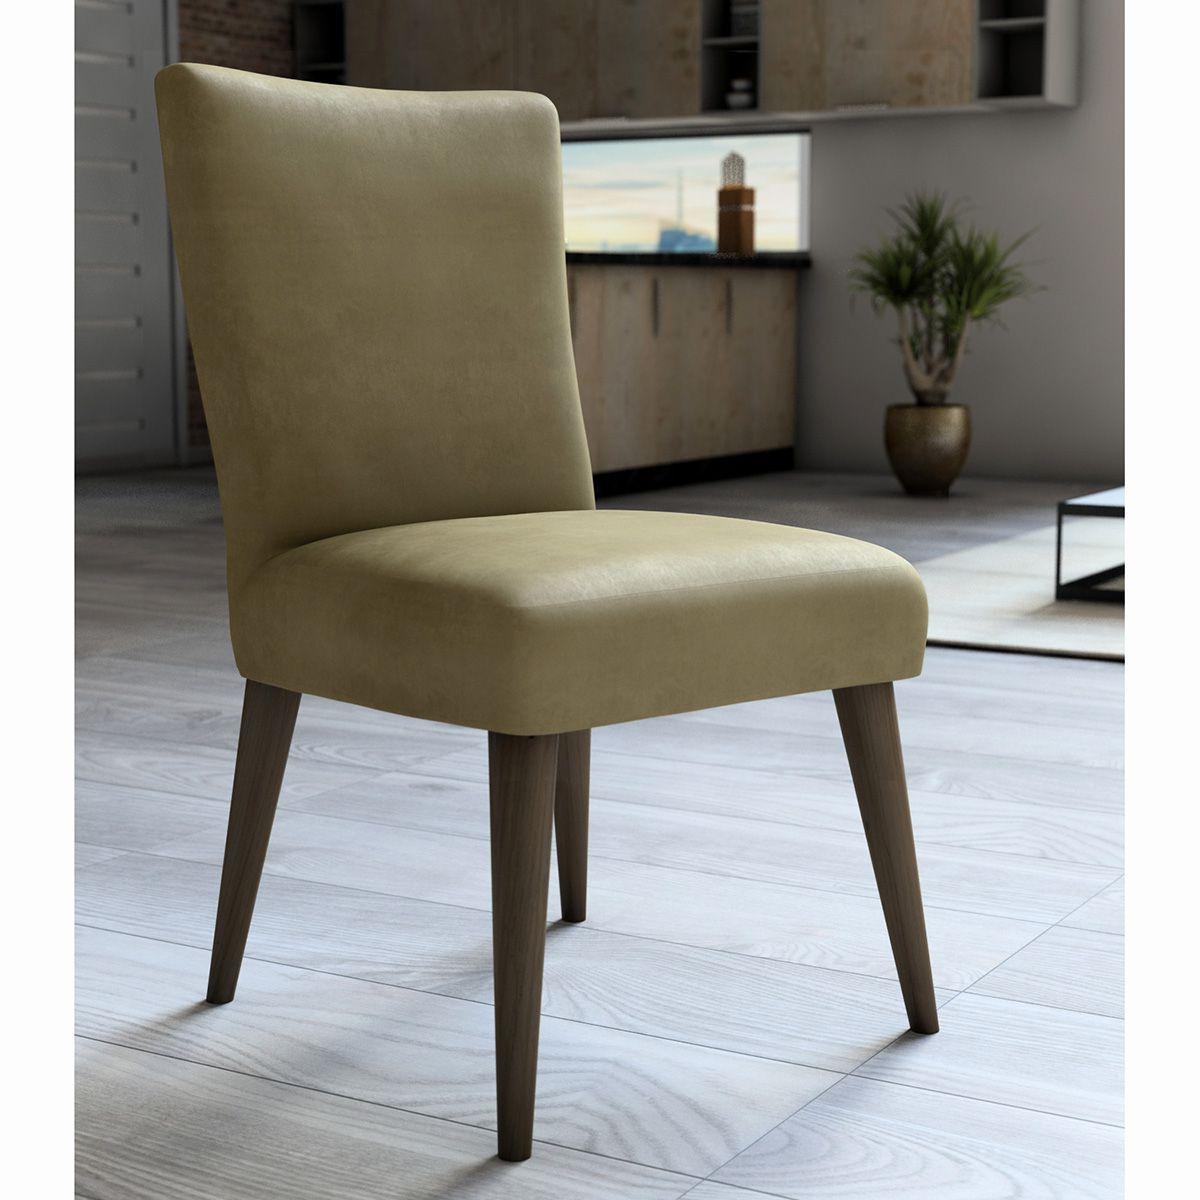 Capa P/ Cadeira - Luxo - Veludo - Bege - Adomes